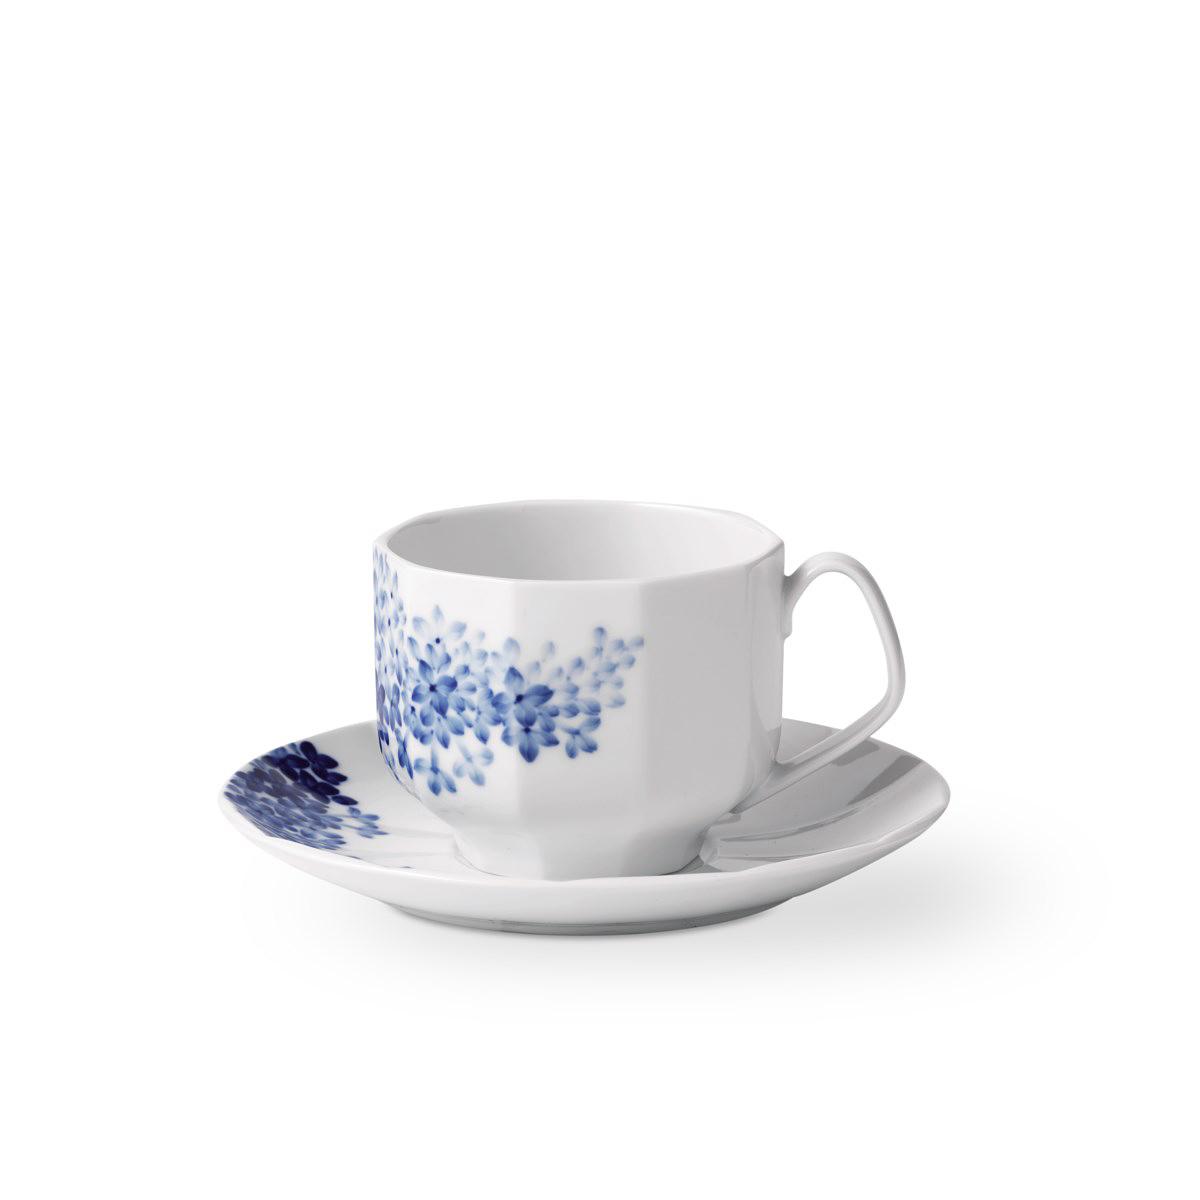 Royal Copenhagen, Blomst Teacup And Saucer Lilac